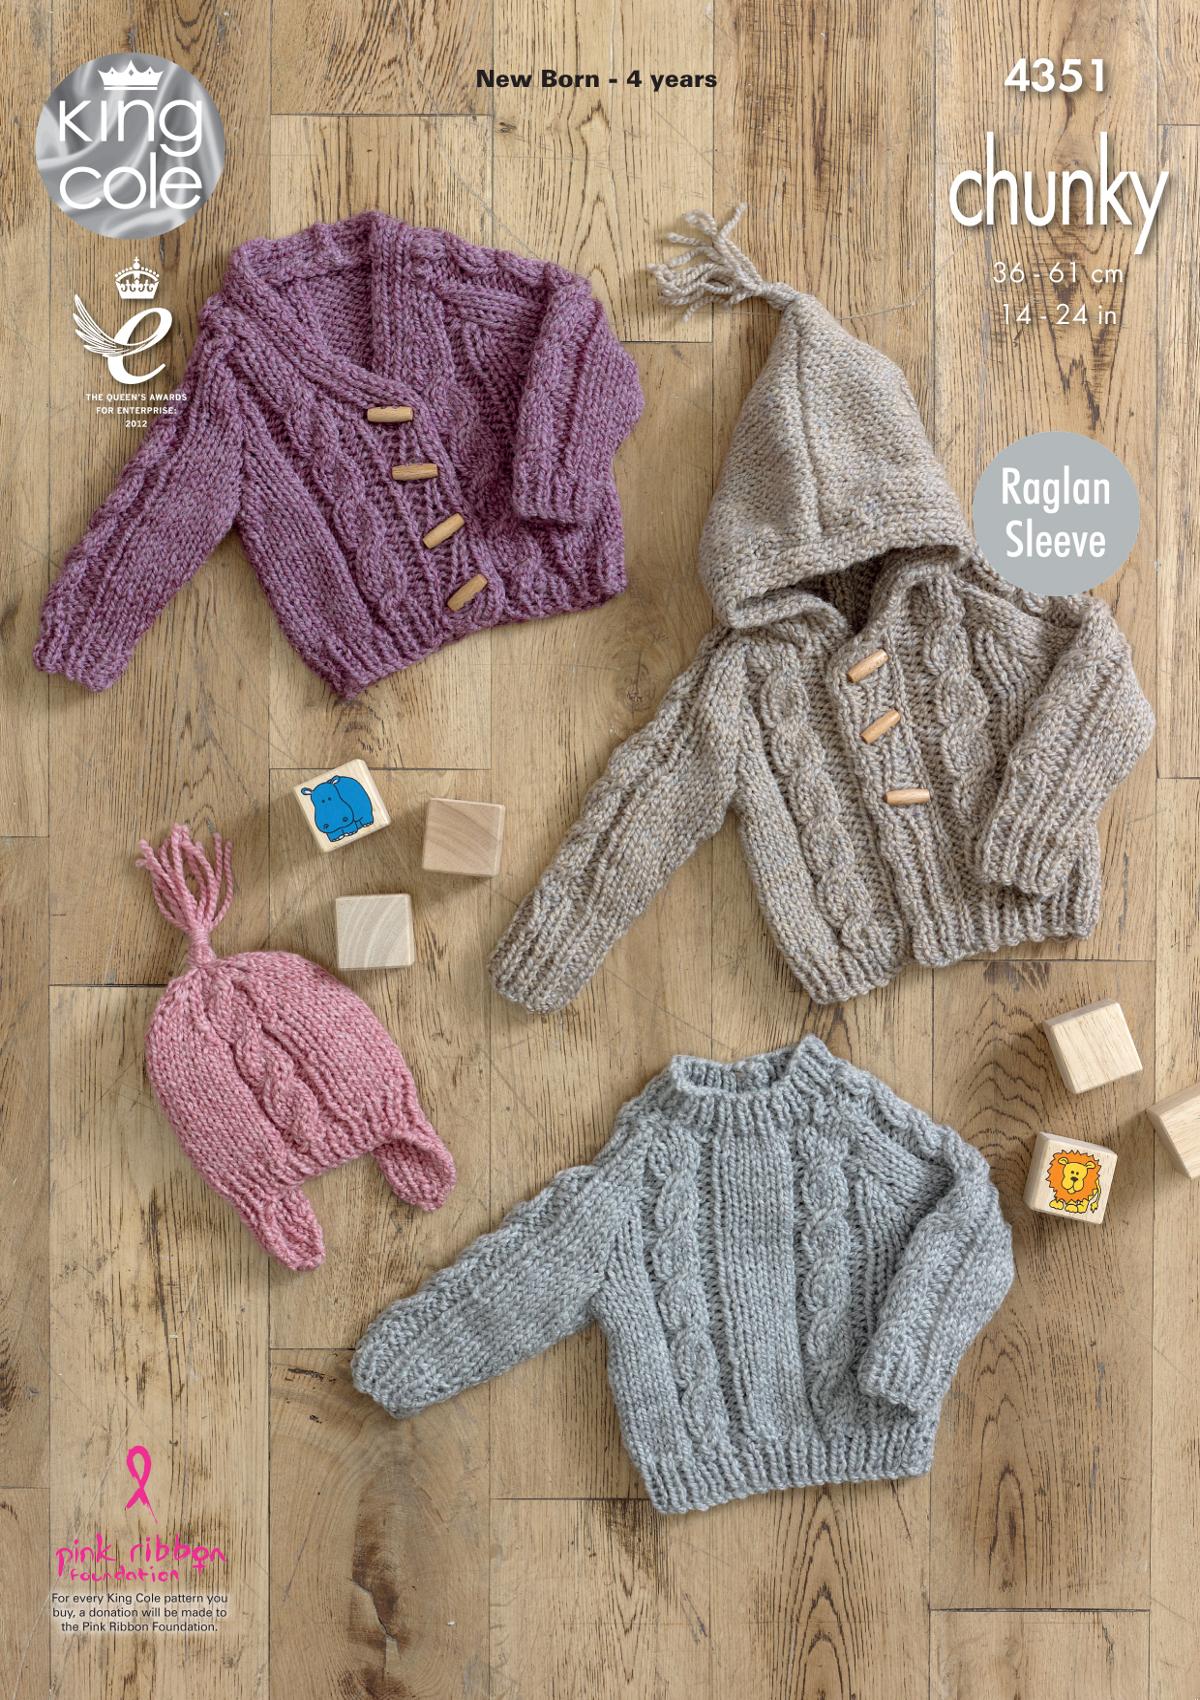 Raglan Sleeve Jumper Cardigans Hat Baby Knitting Pattern King Cole ...